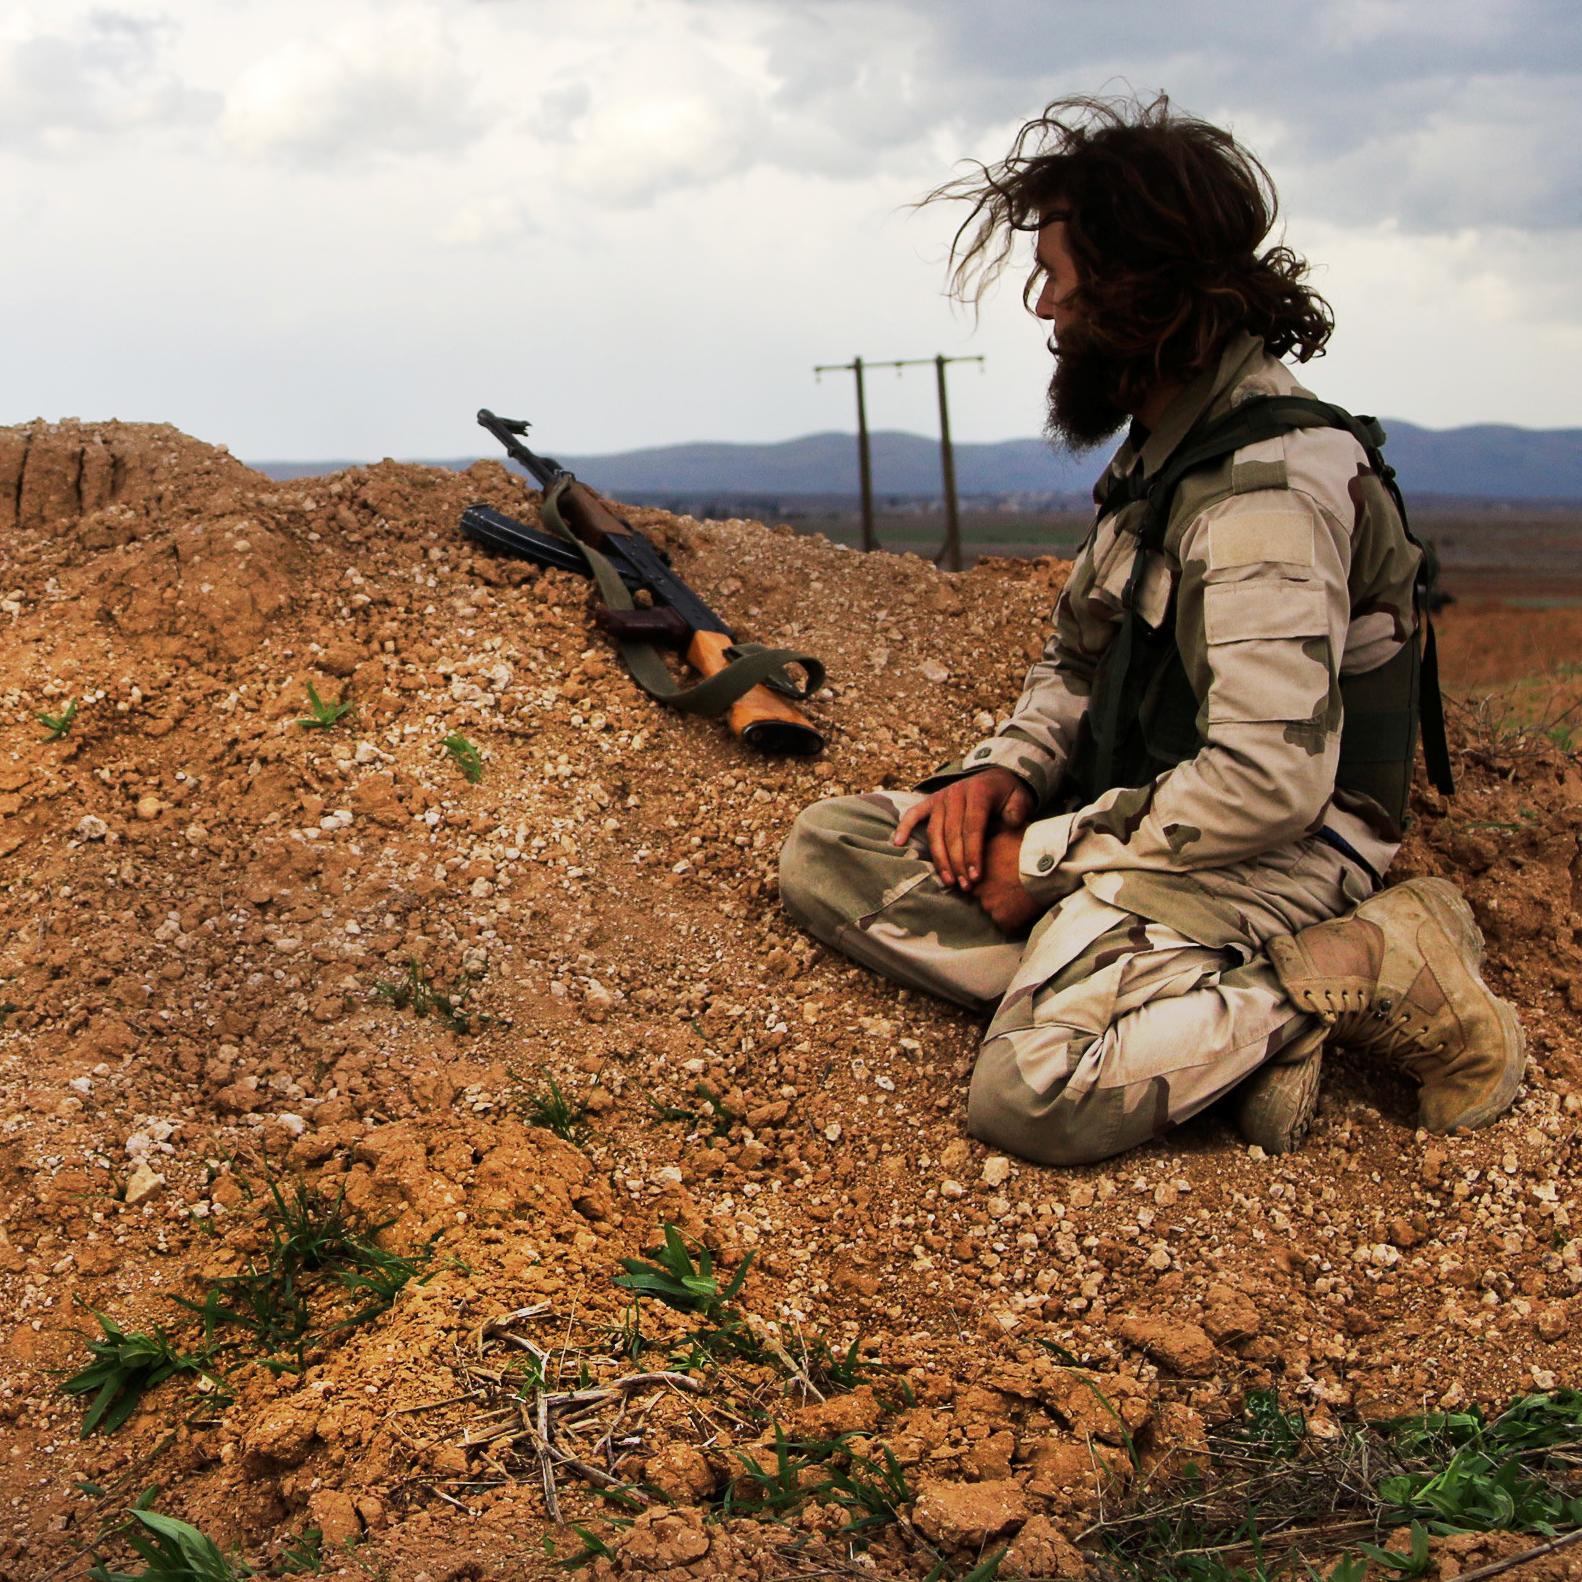 Syrien-Krieg